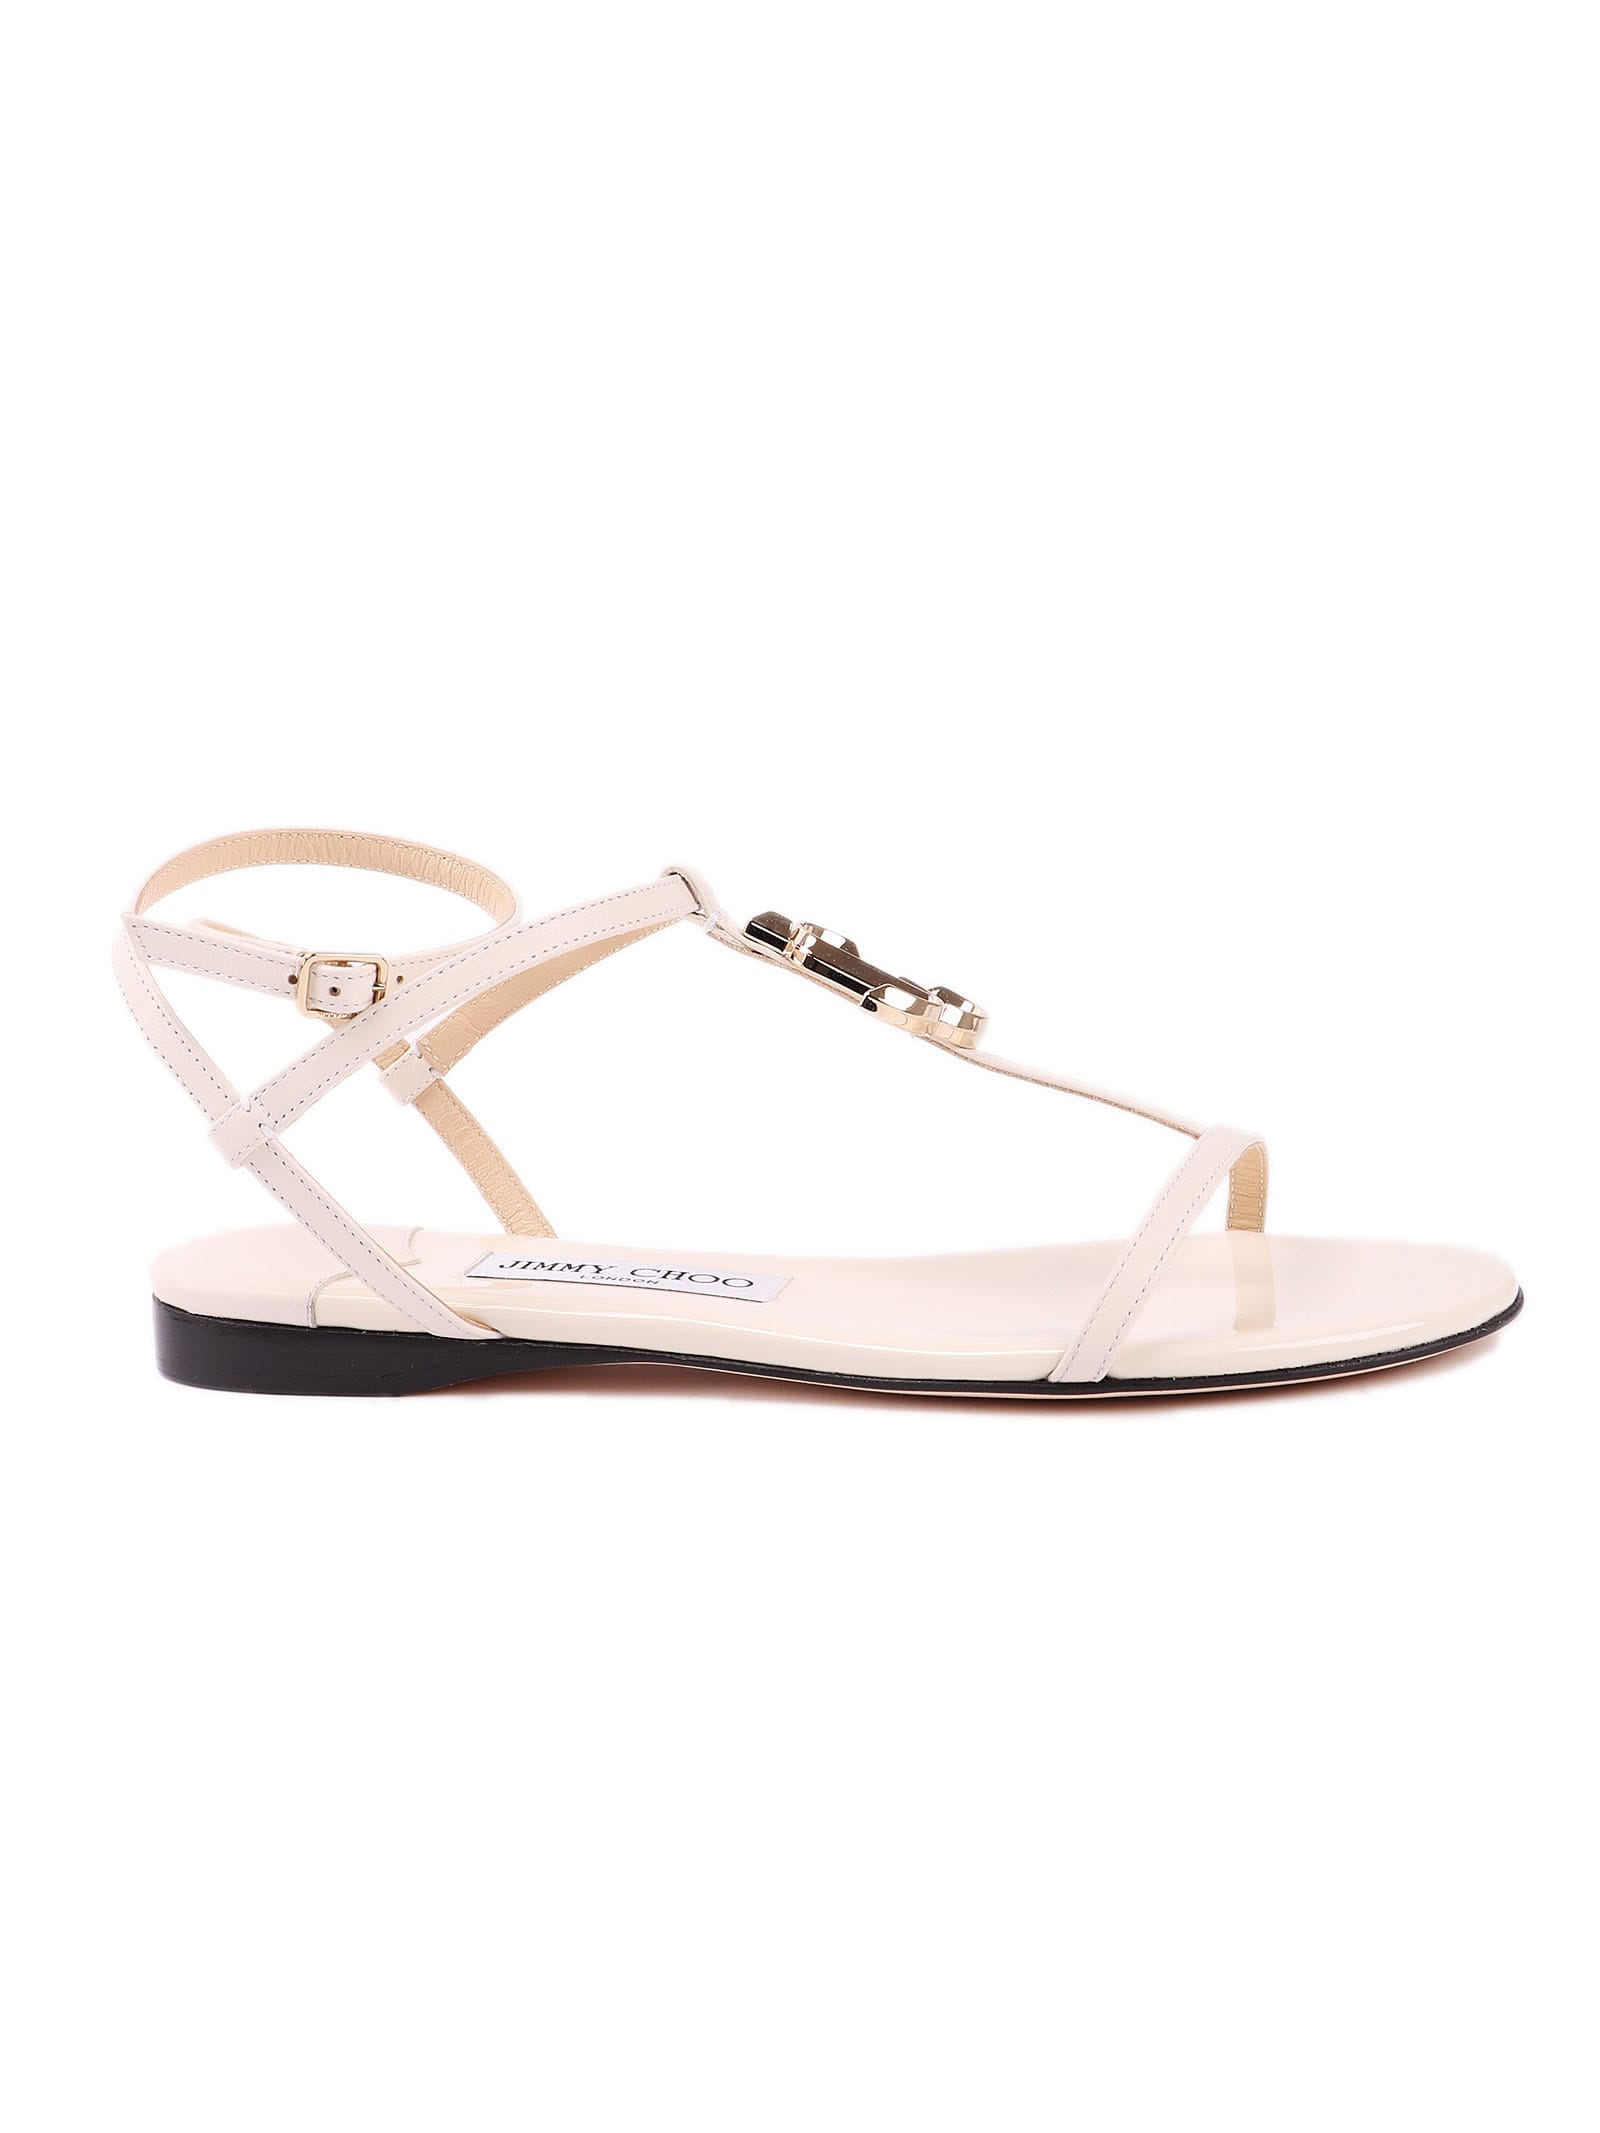 Jimmy Choo Sandal Flat Nappa Patent